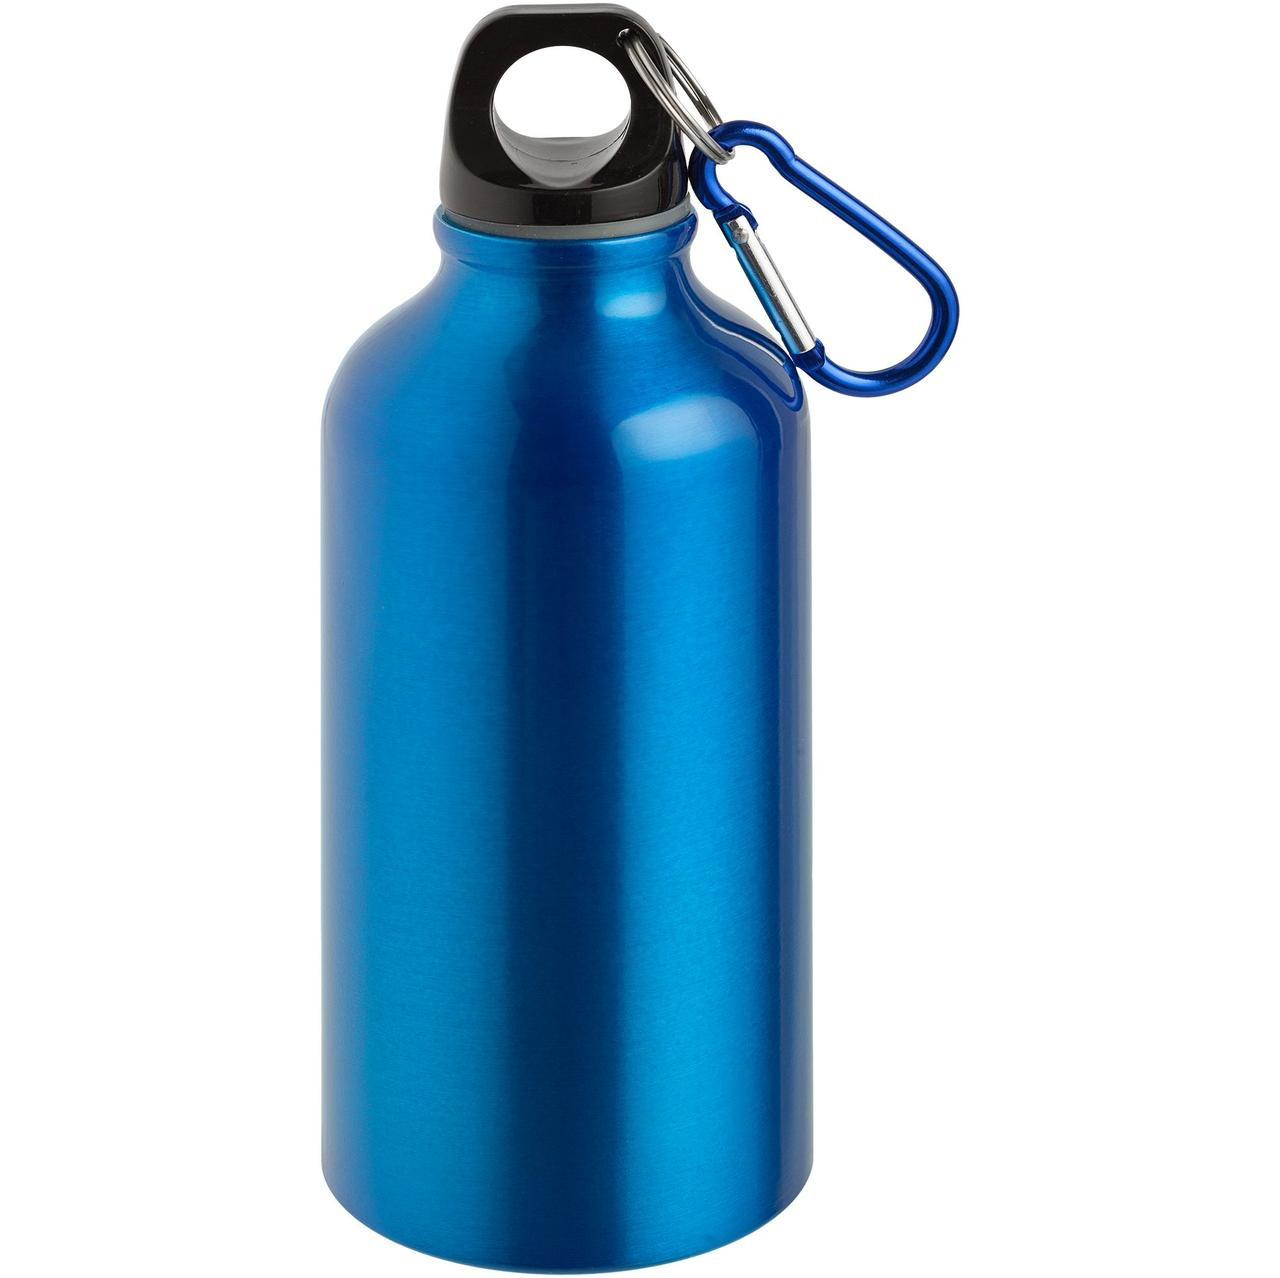 Бутылка для спорта Re-Source, синяя (артикул 7504.40)